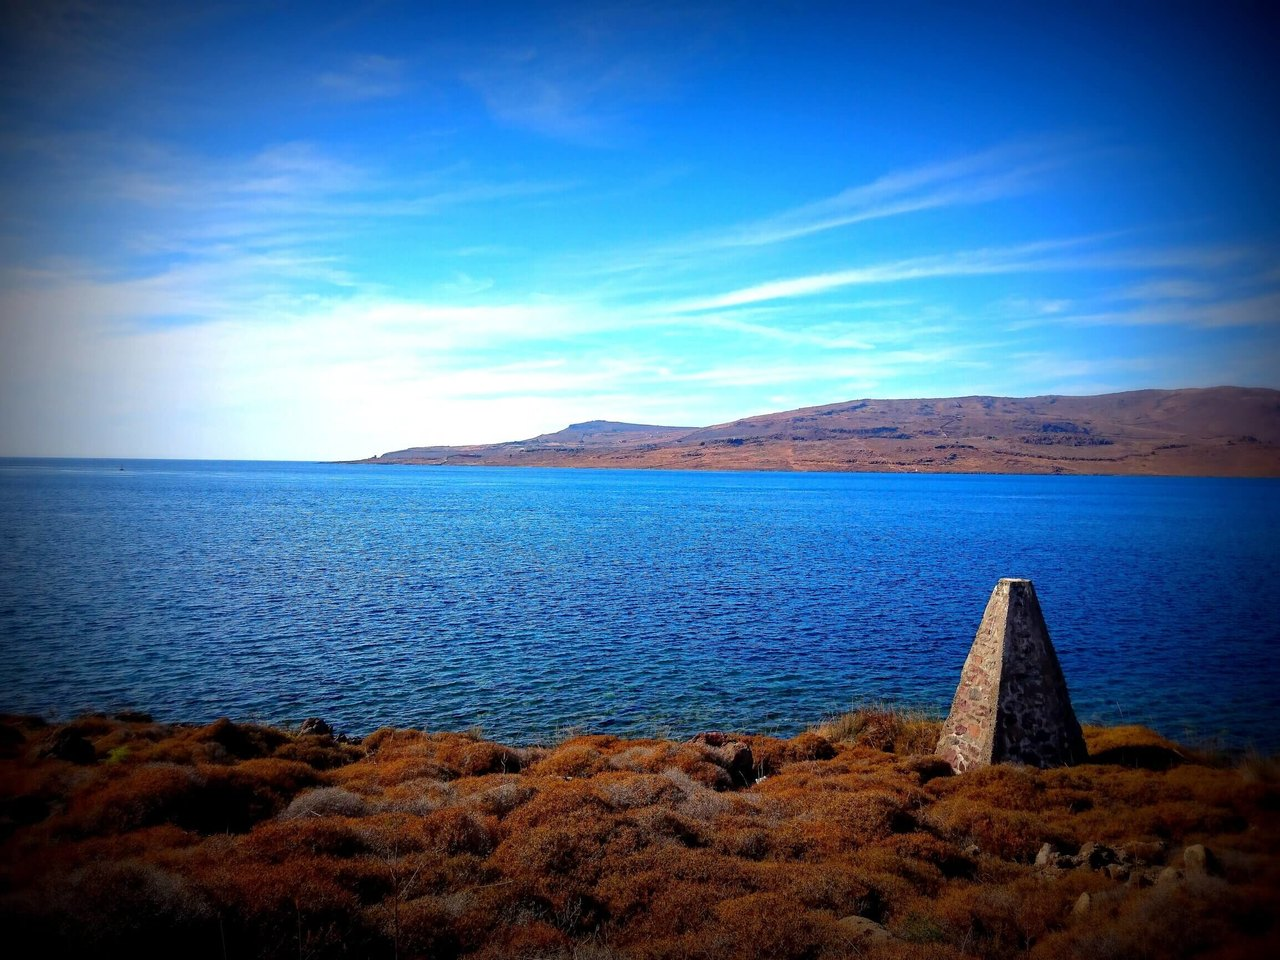 Widok na morze i piramidkę